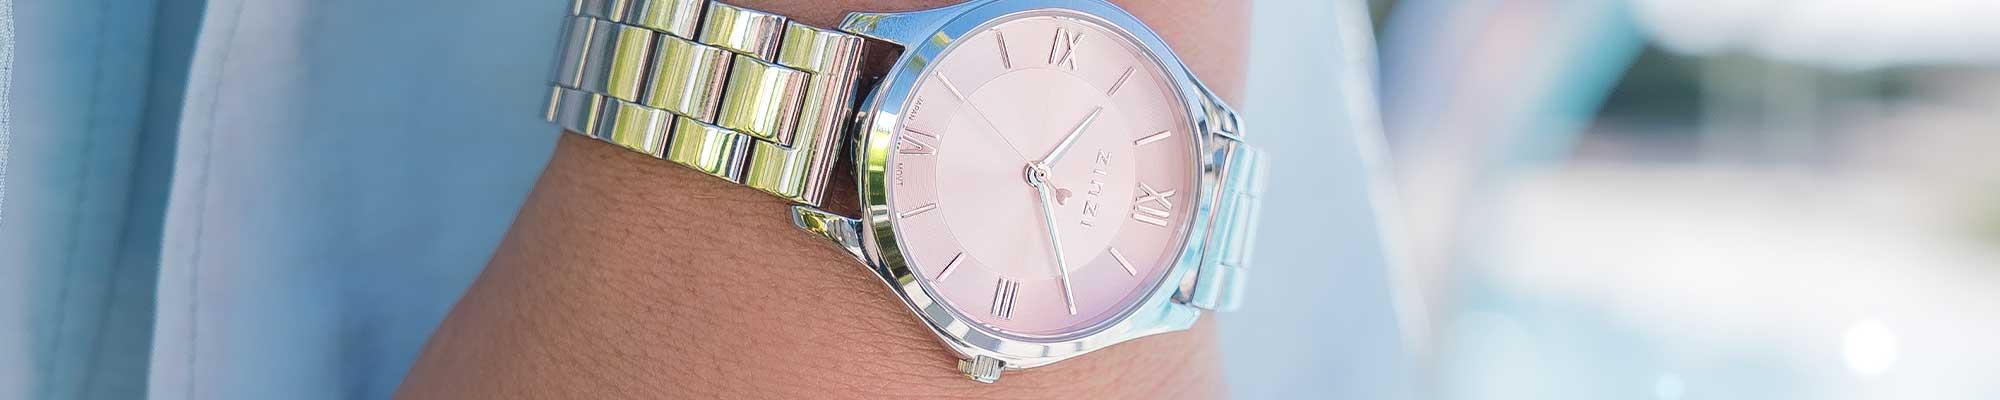 Classy Mini Horloges